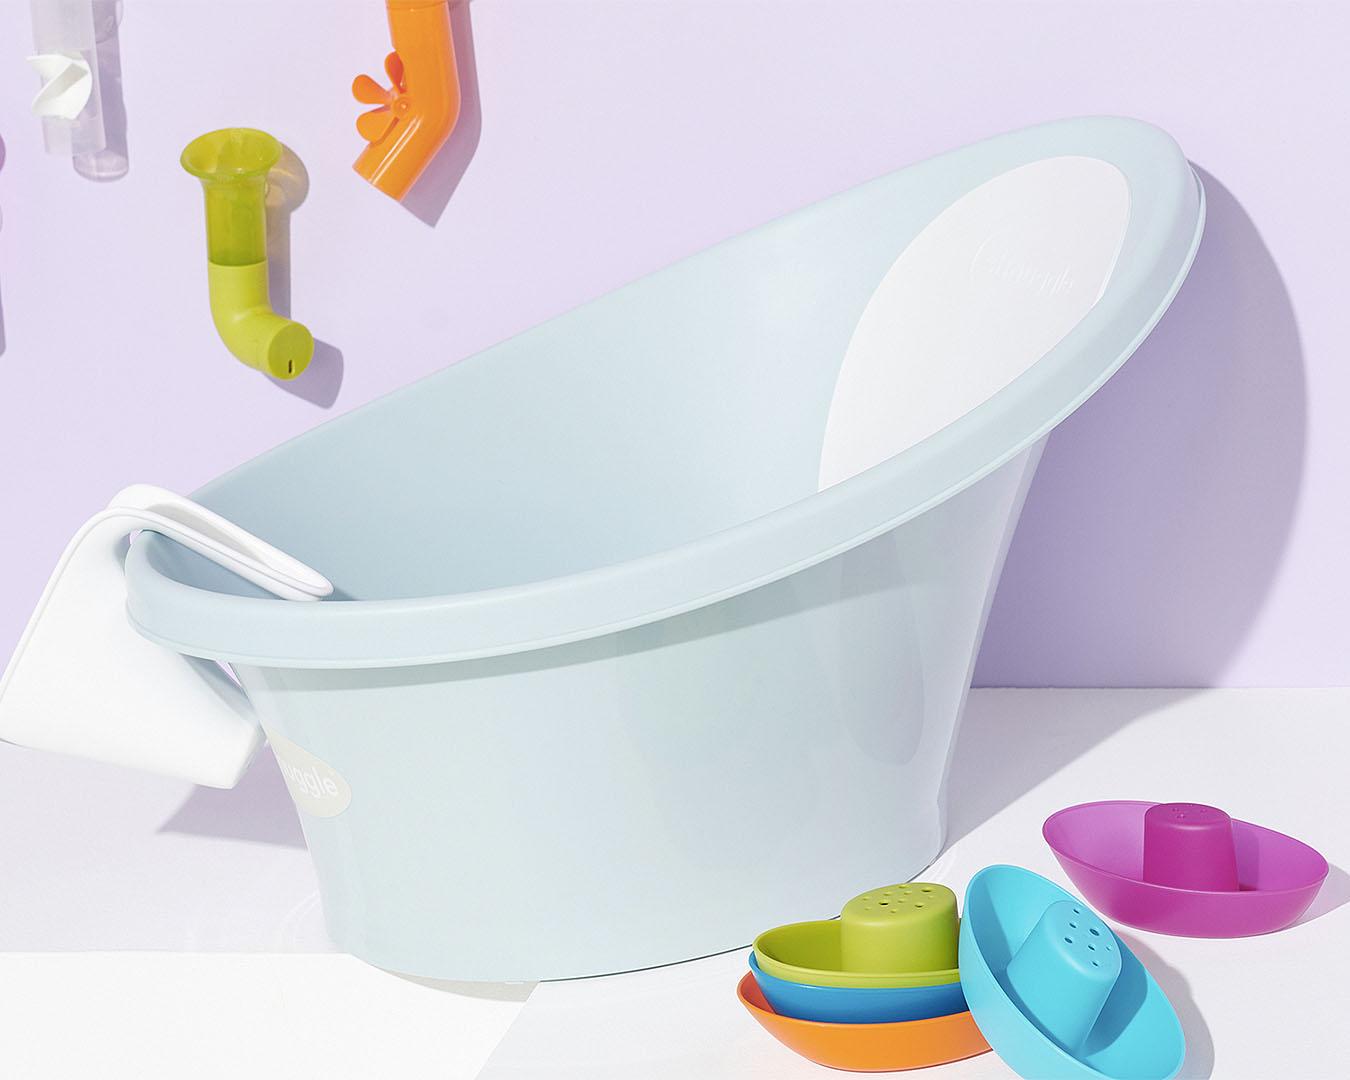 A little baby bath with bath toys around.